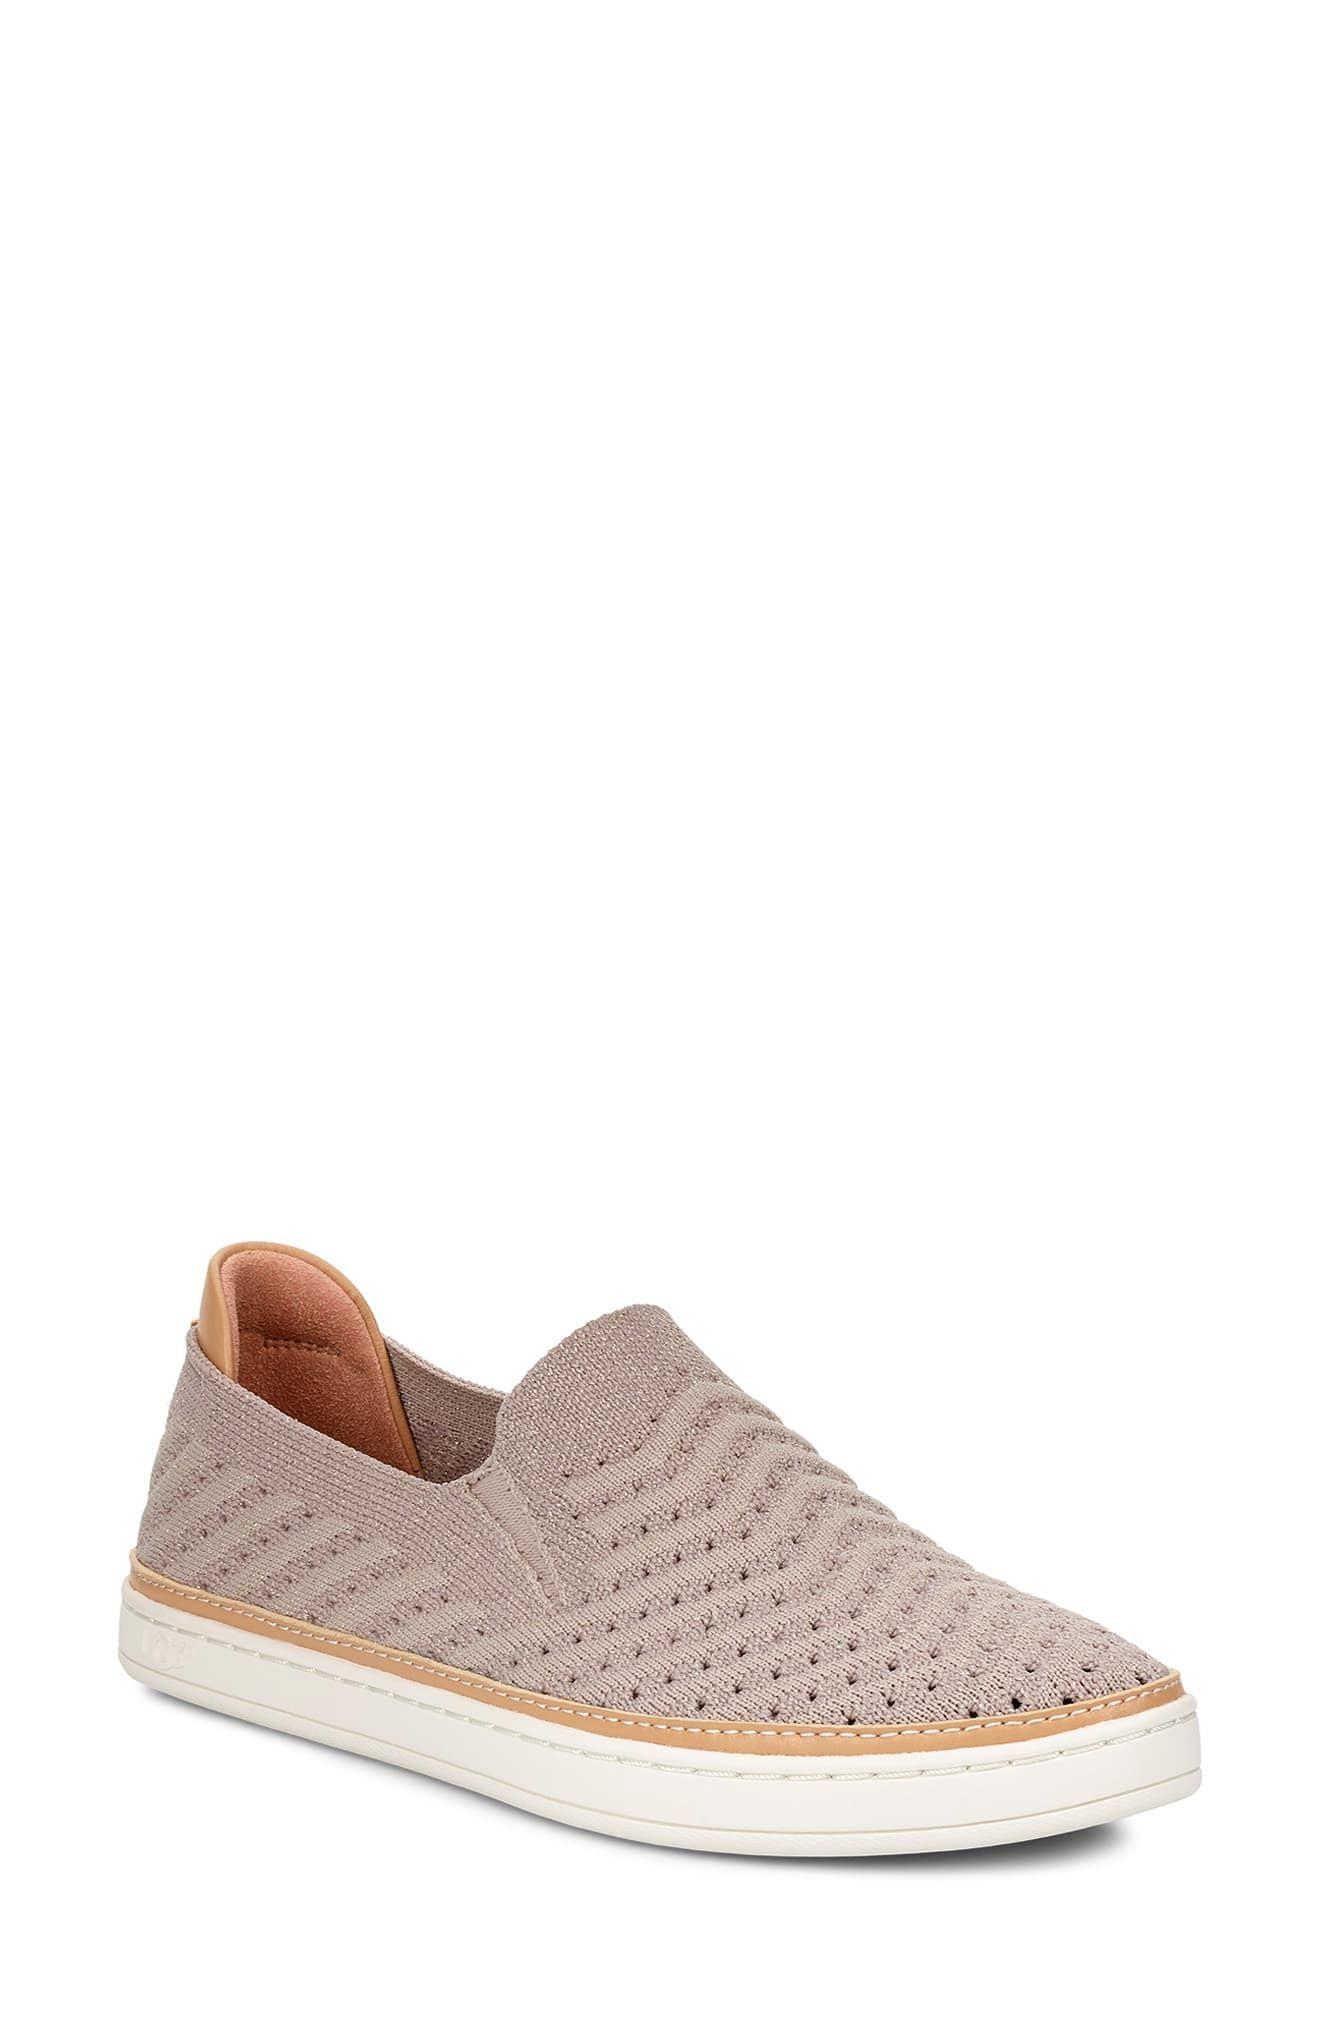 aaeebd23188 Women's Ugg Sammy Slip-On Sneaker, Size 5 M - White in 2019 ...